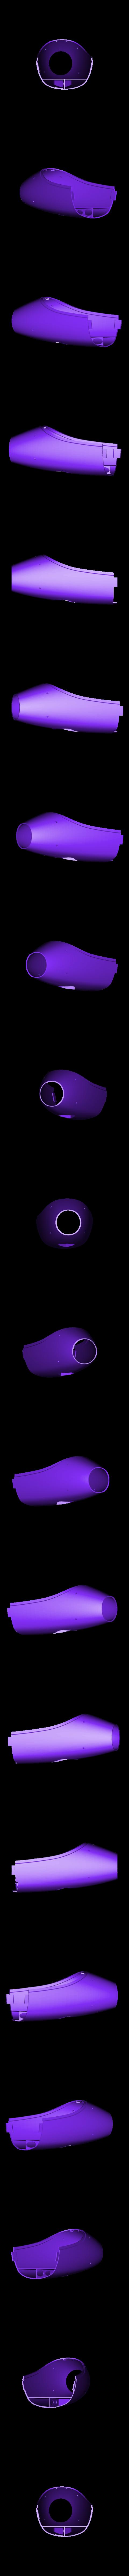 Fus1.stl Download free STL file RC plane fuselage - Eclipson model Z • 3D printer design, Eclipson